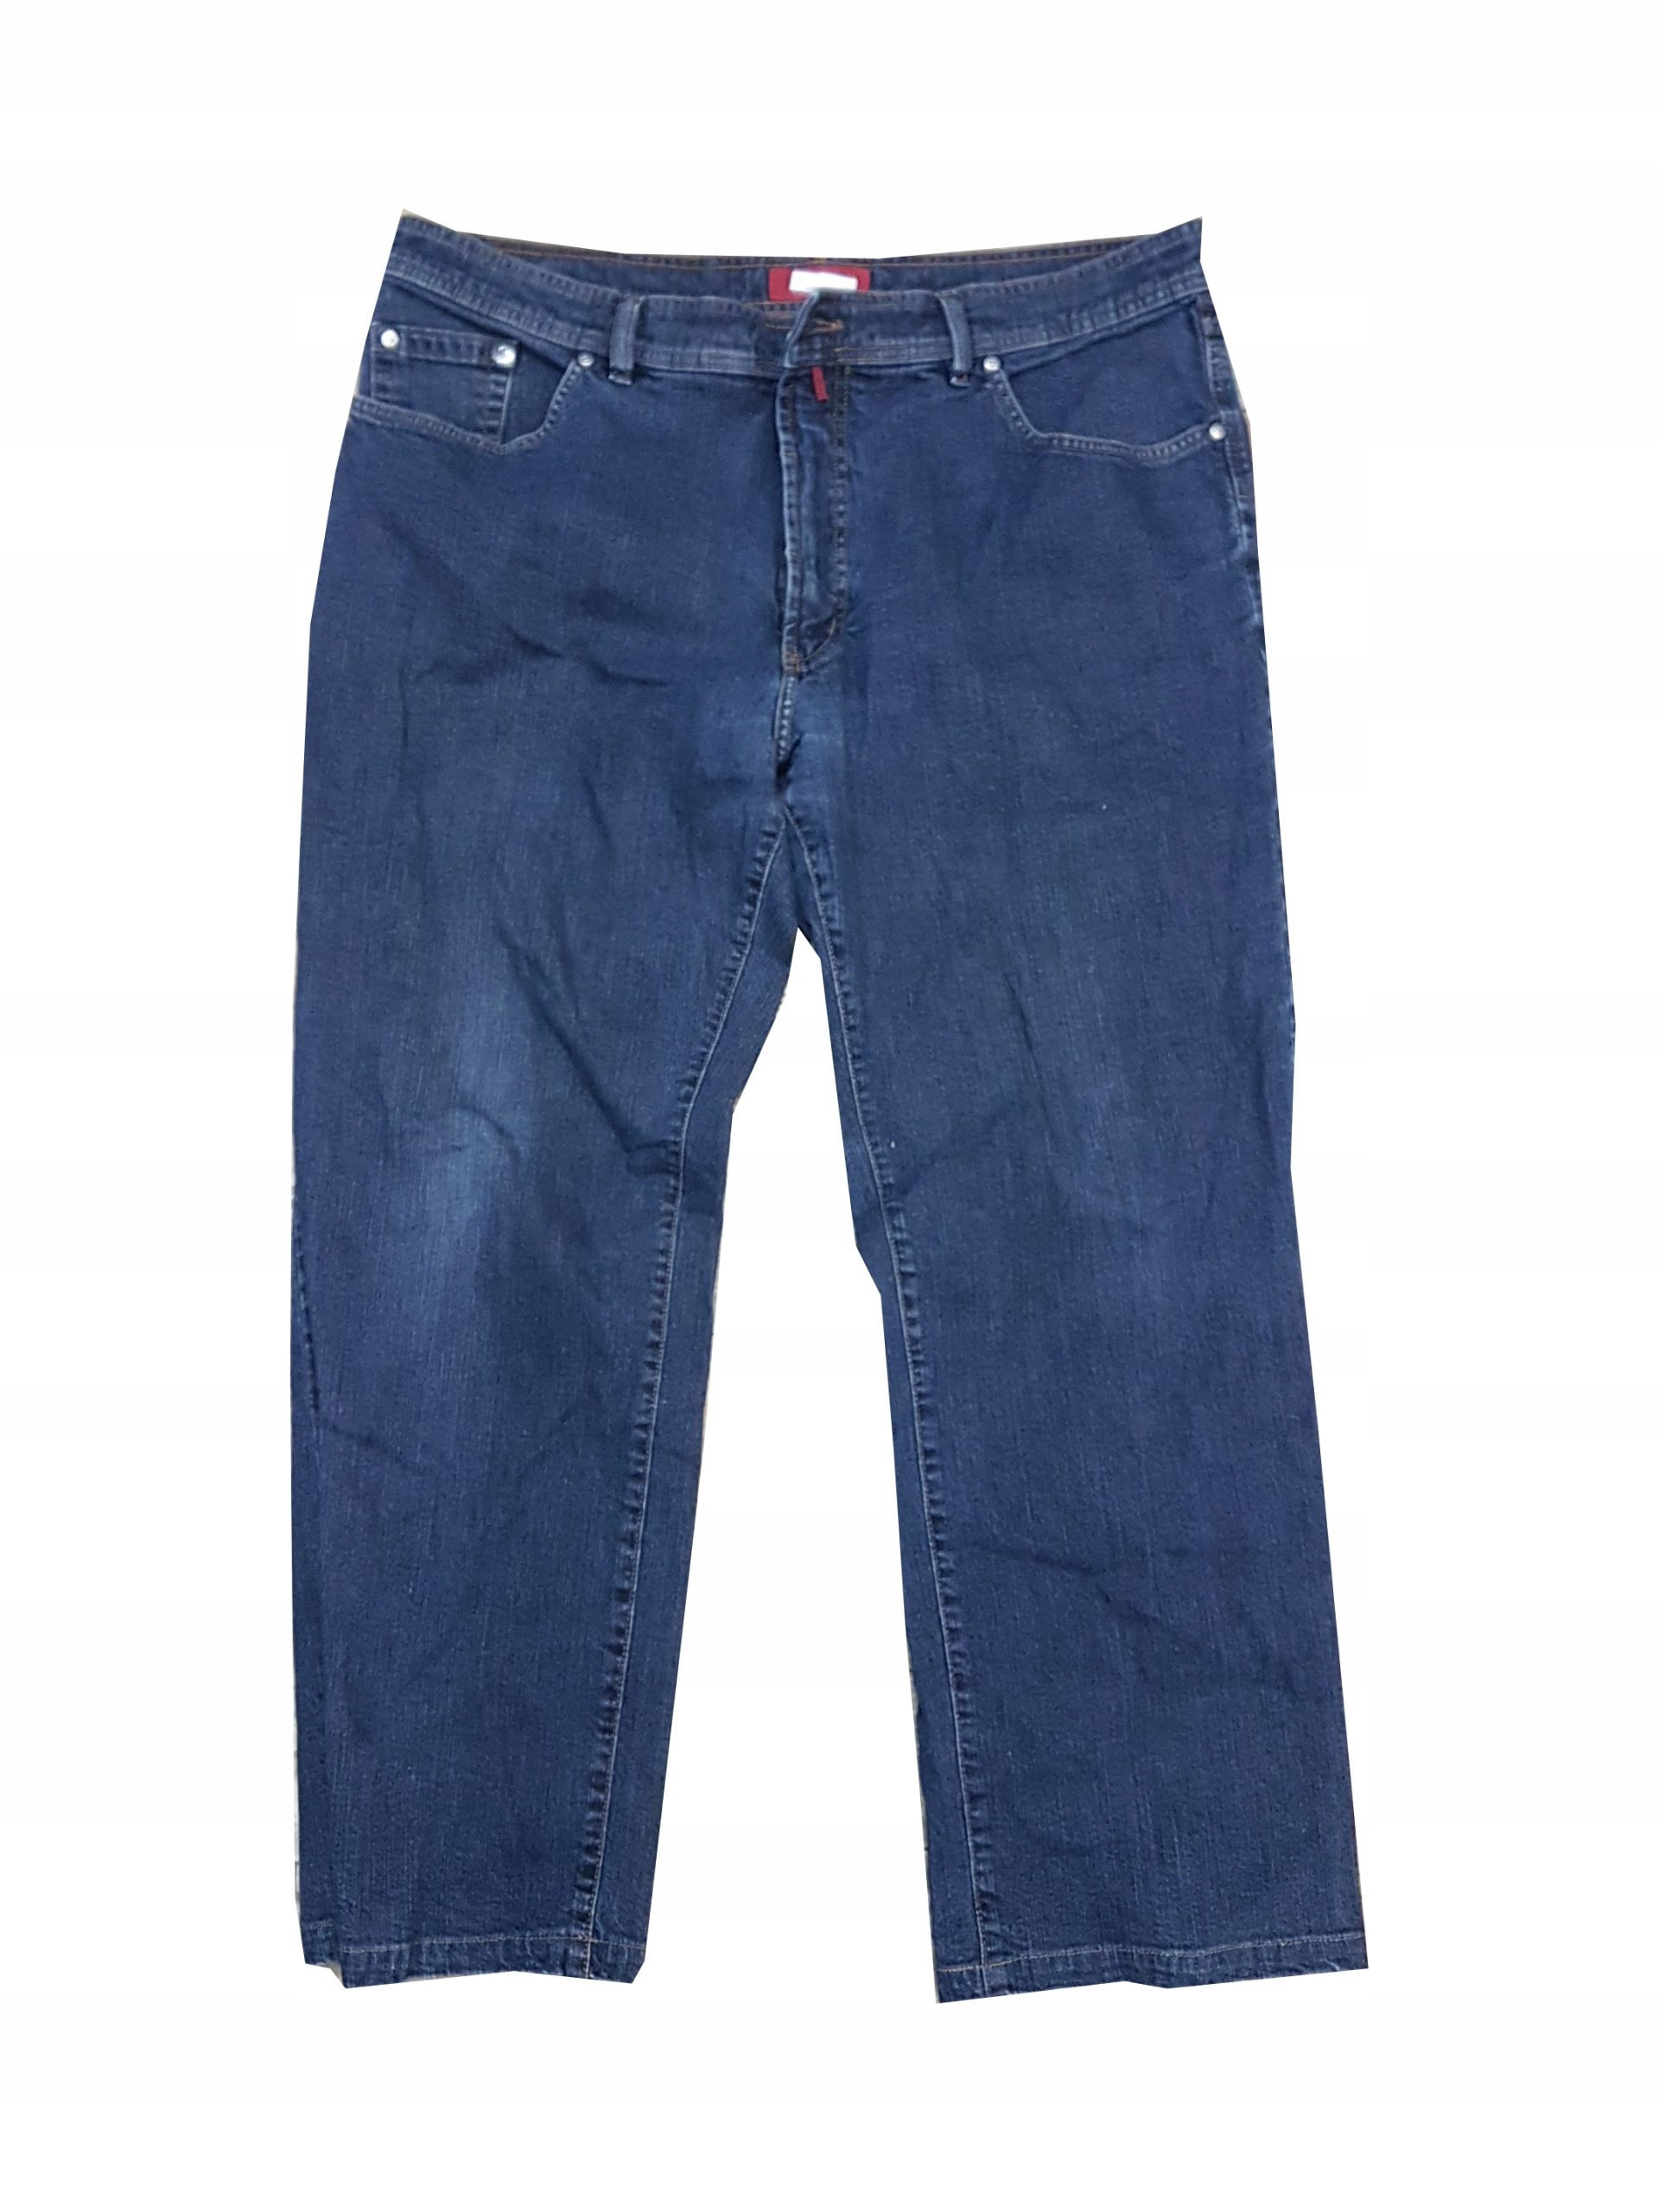 PIERRE CARDIN jeansy proste 4030 pas 102